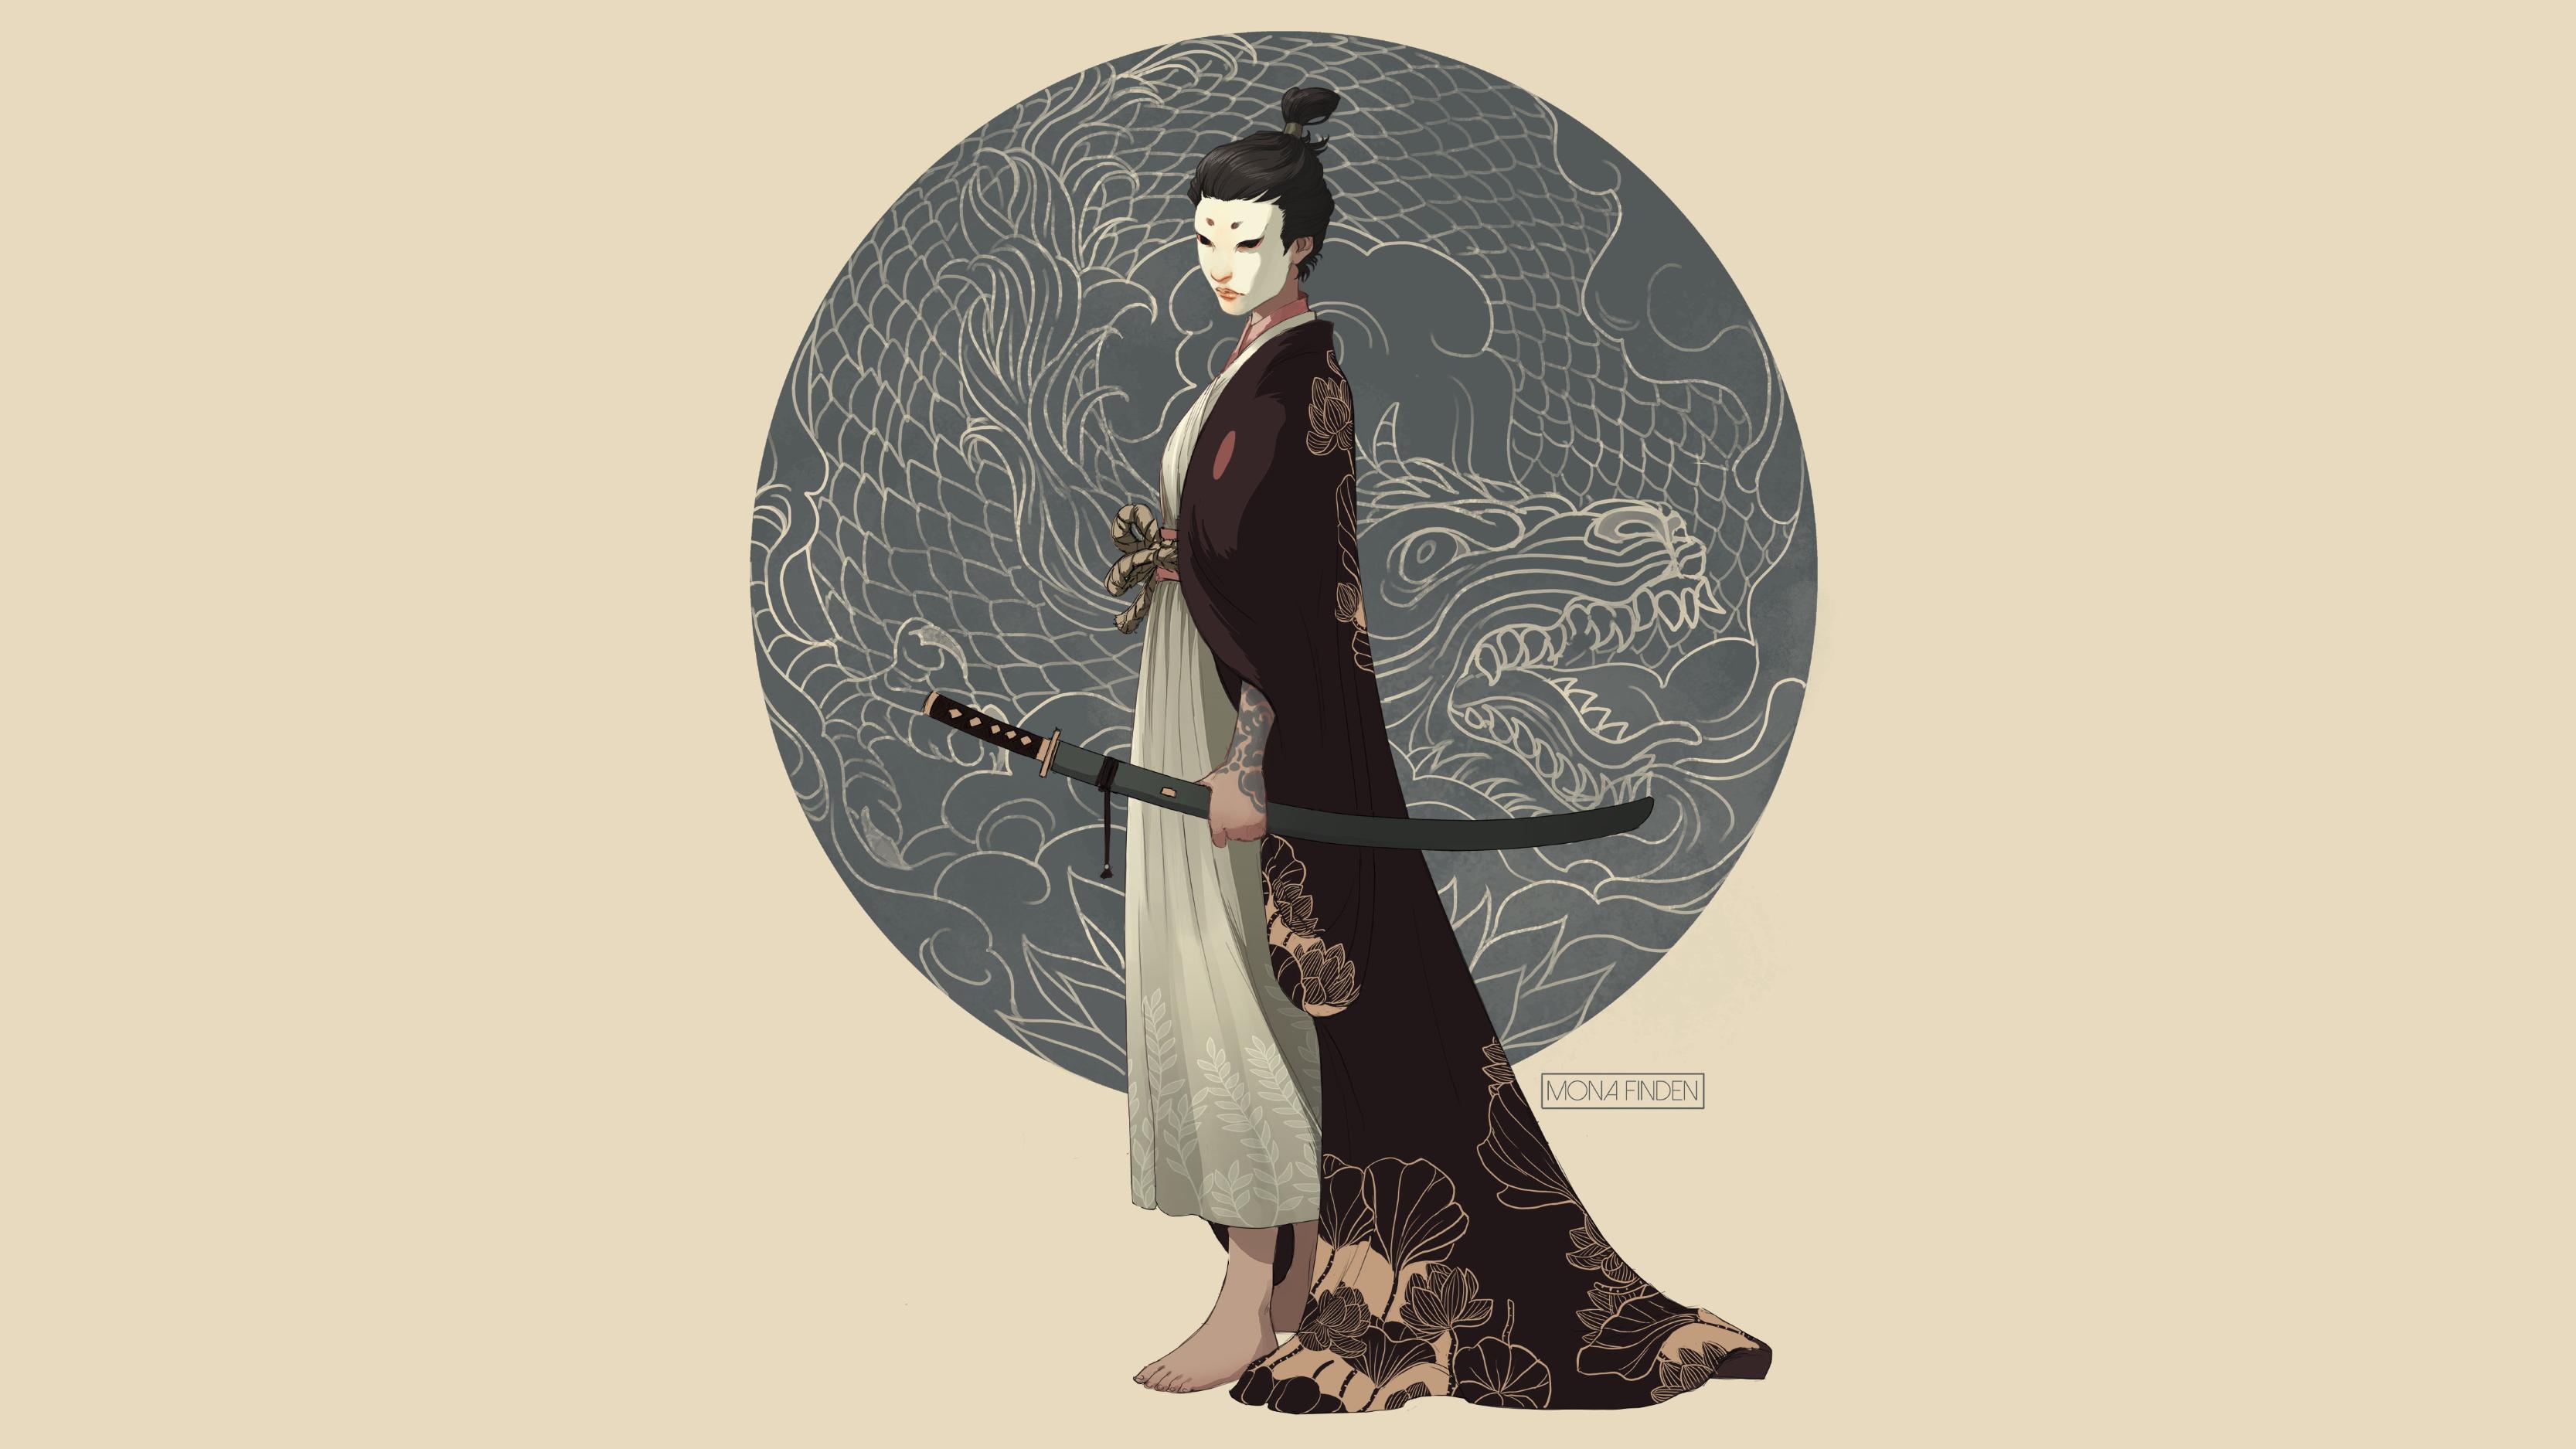 Artwork digital art illustration drawing beige background simple background circle standing side view mona finden women fantasy girl